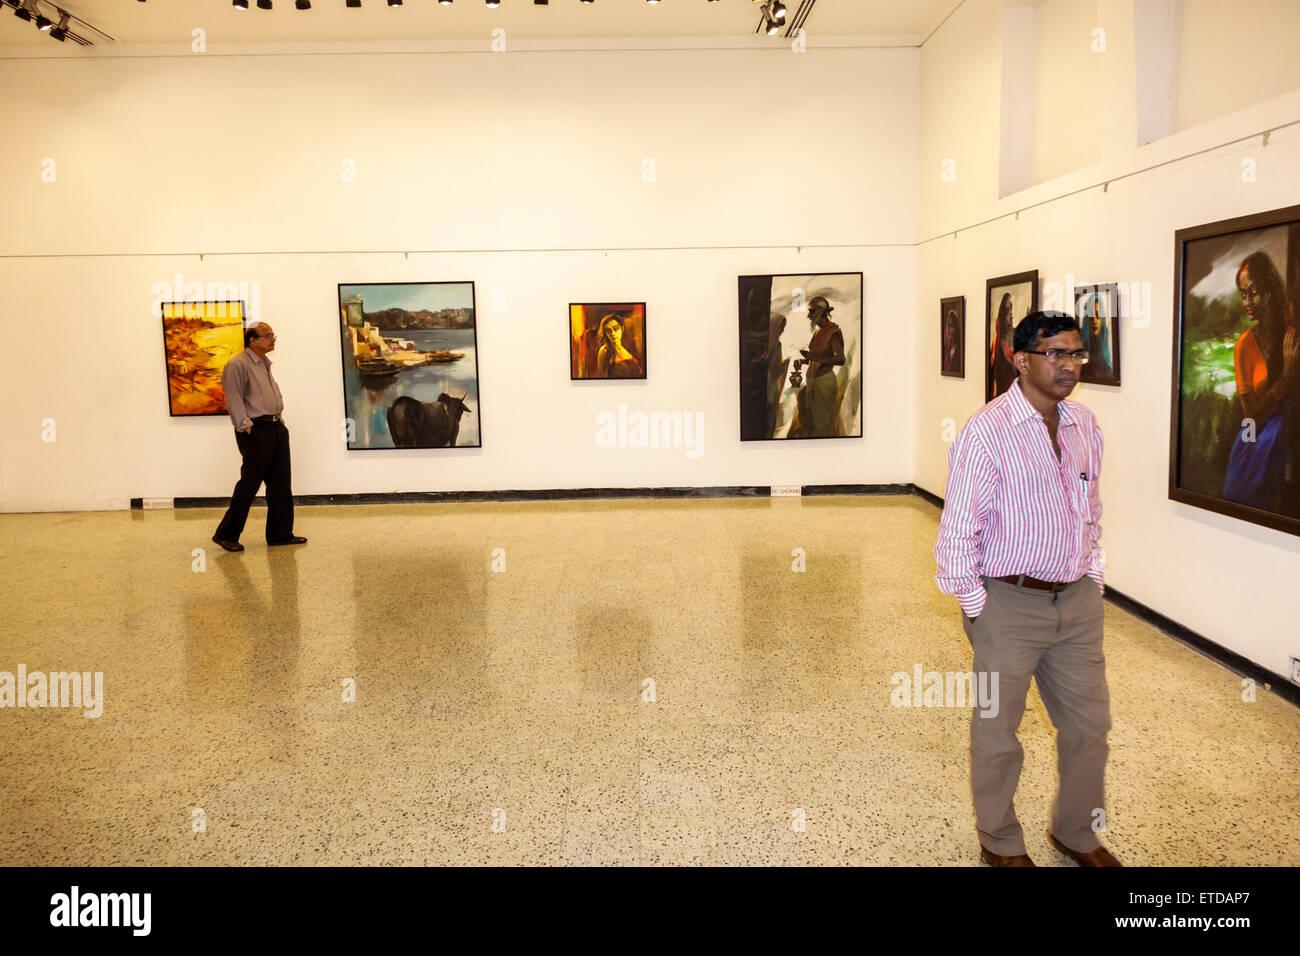 india indian asian mumbai fort mumbai kala ghoda jehangir art gallery stock photo  royalty free